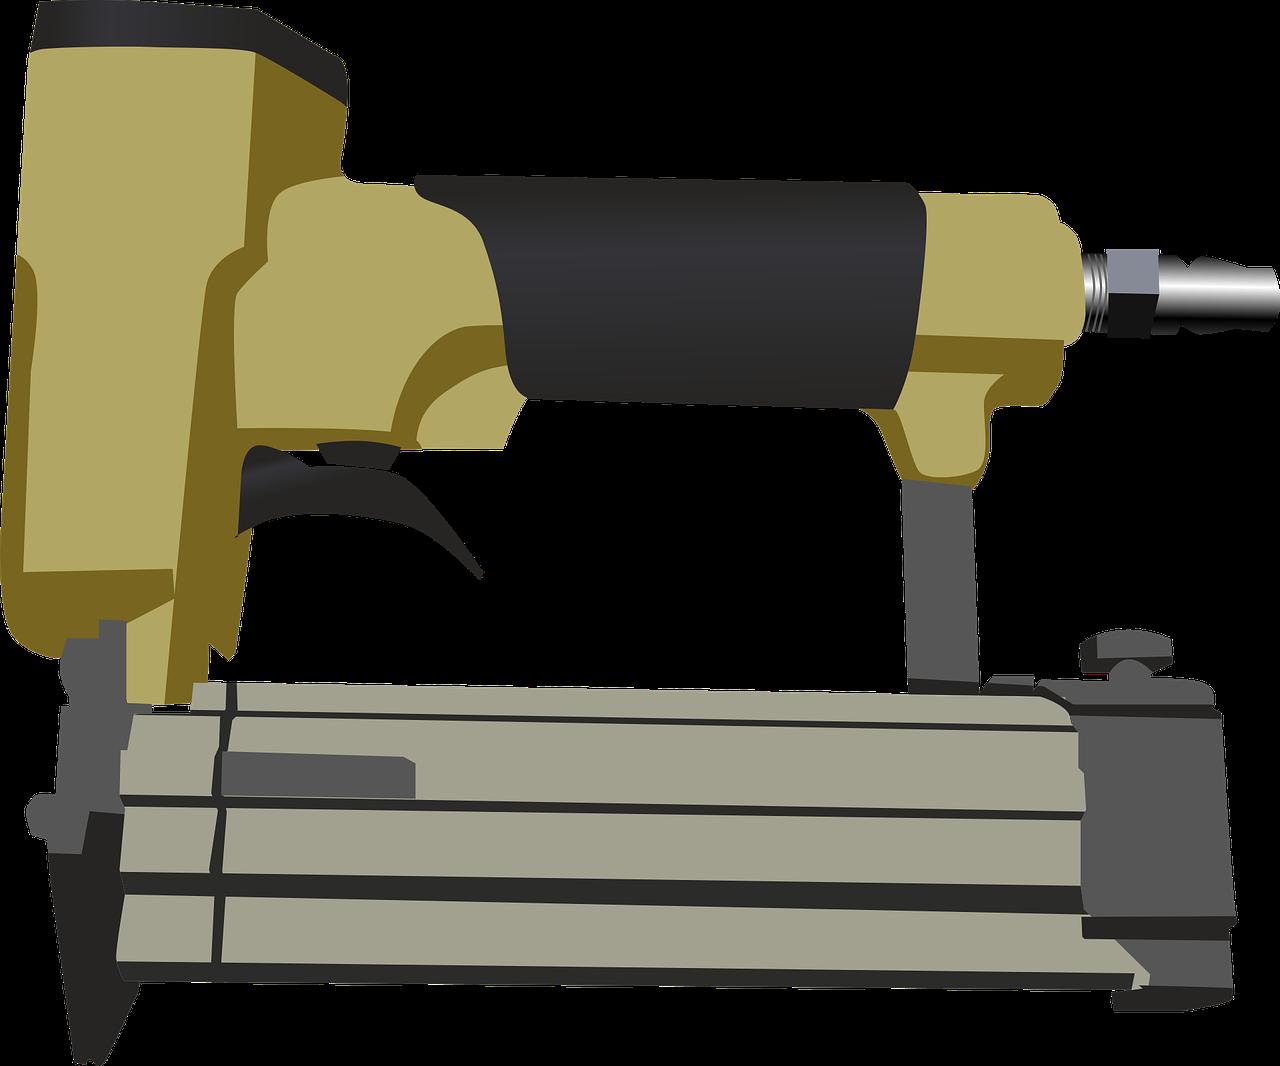 Top benefits of using. Clipart gun roofing